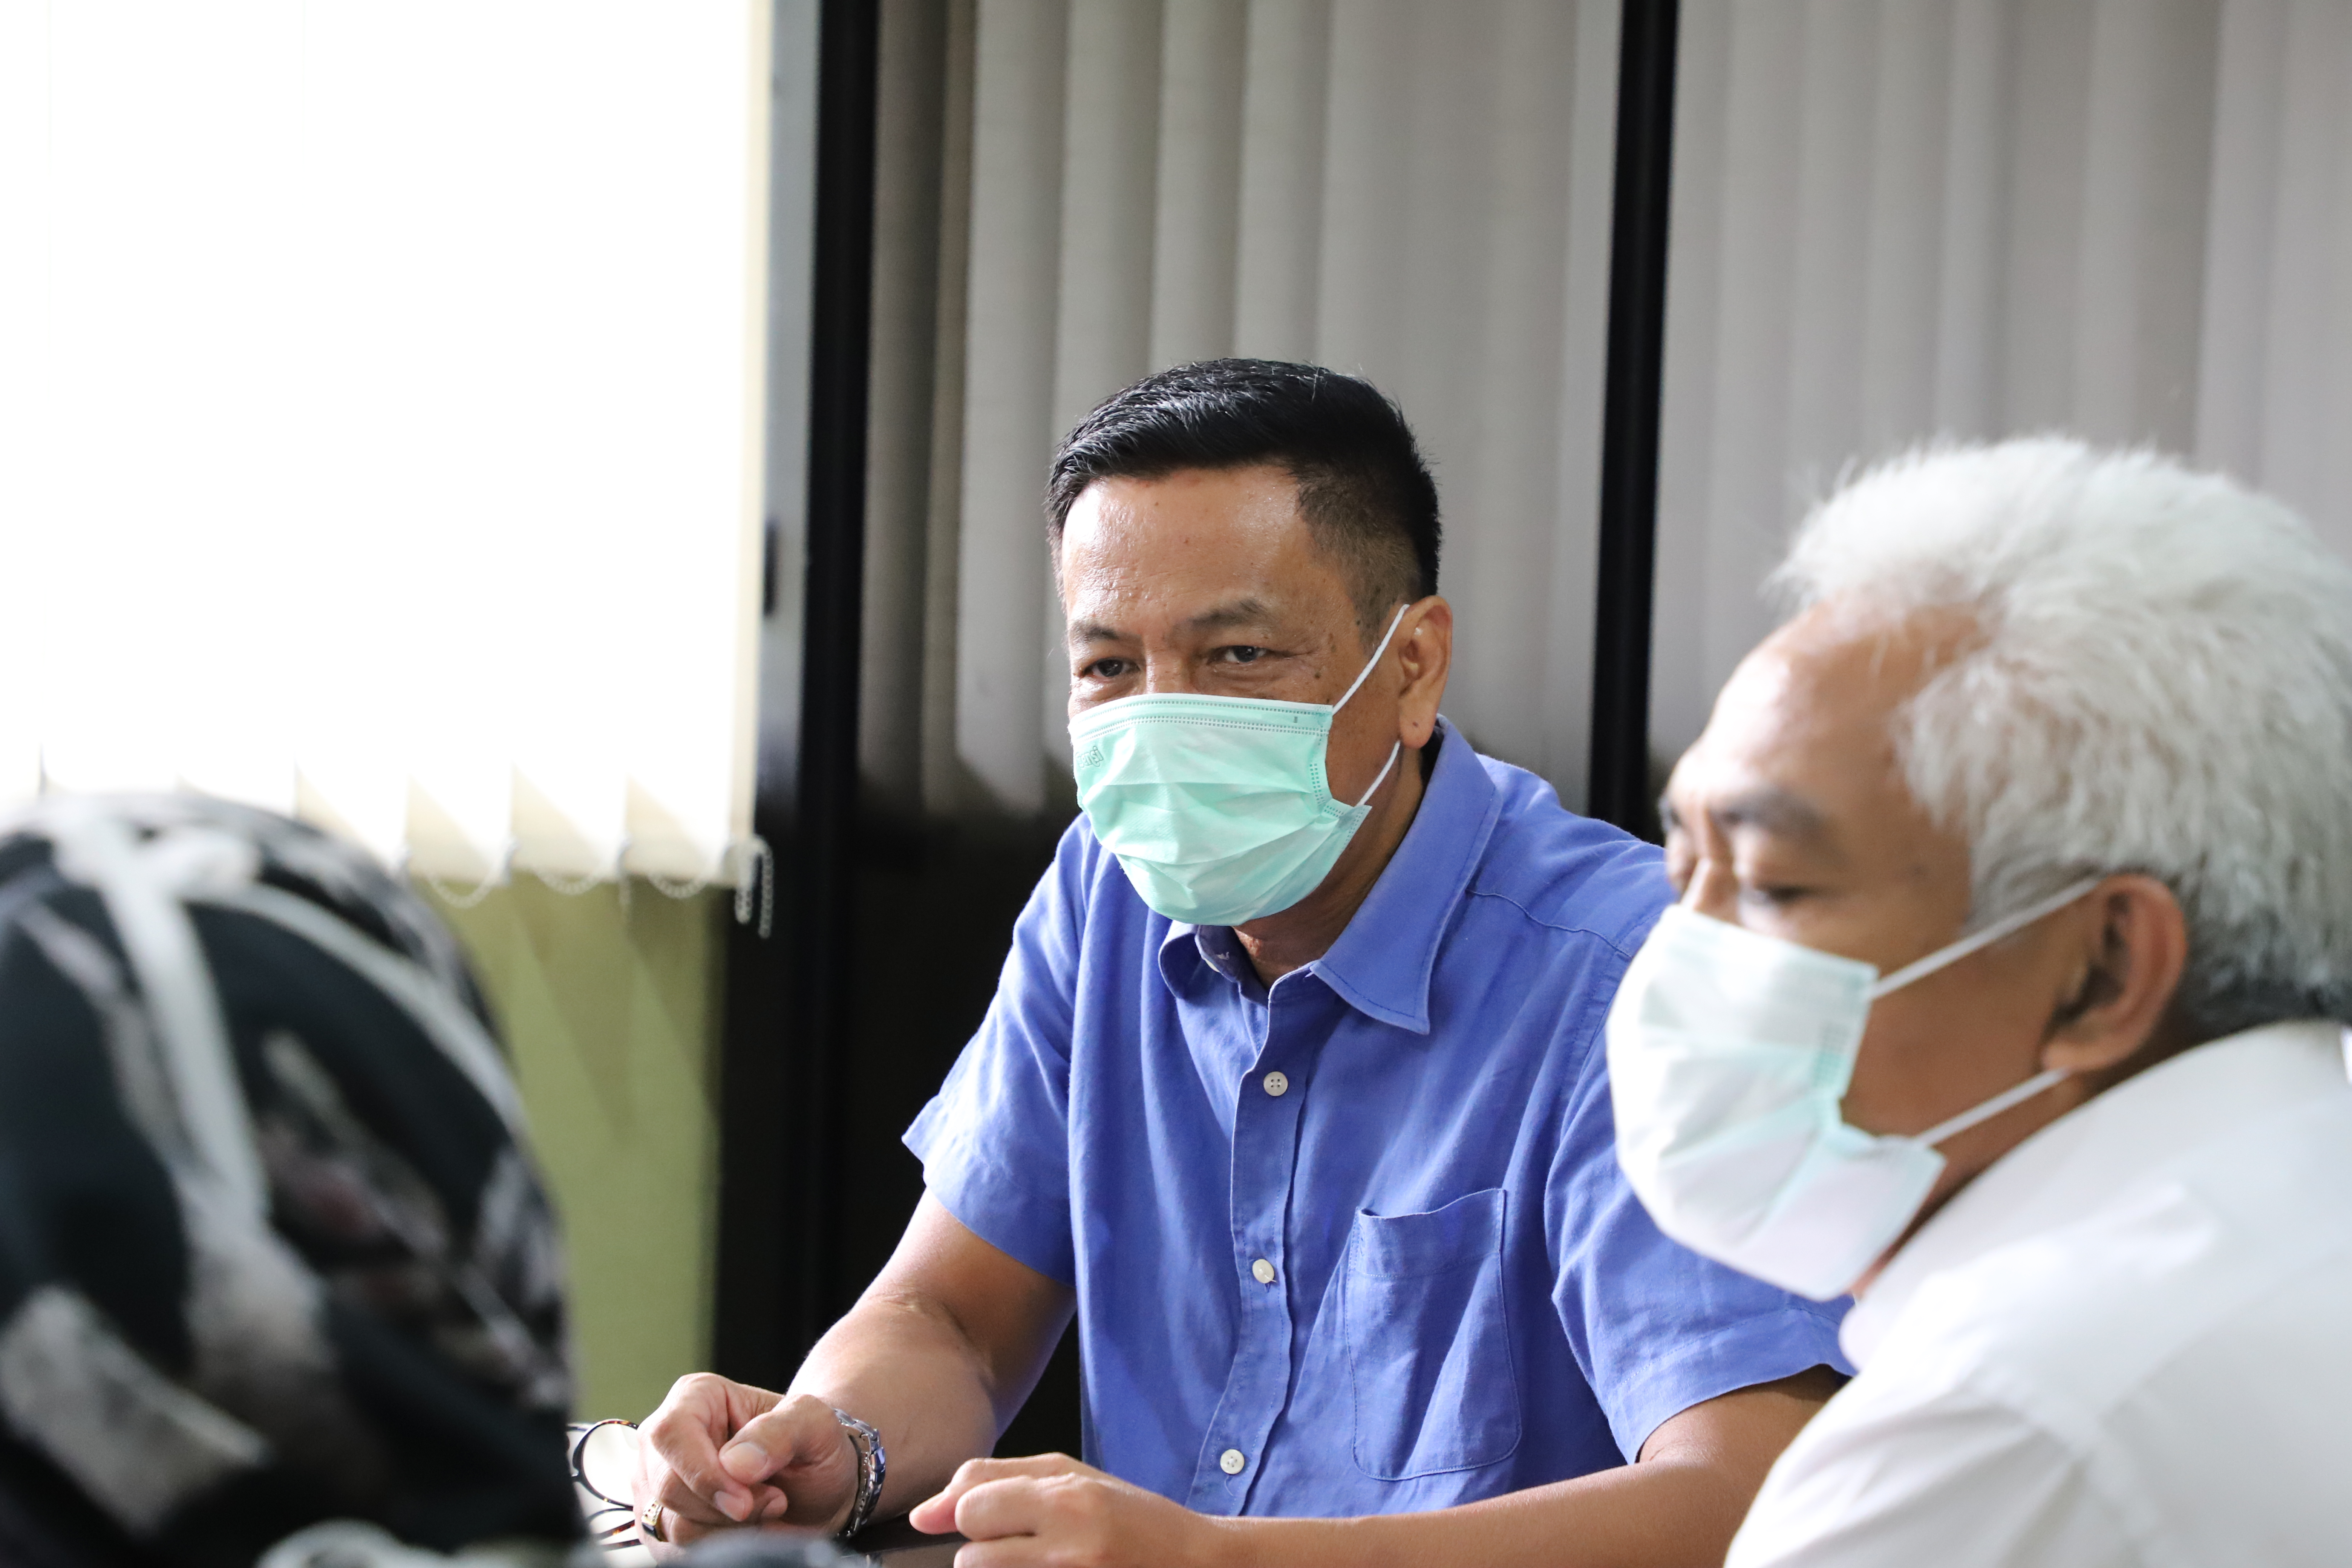 ika_alumni_peduli_6.JPG